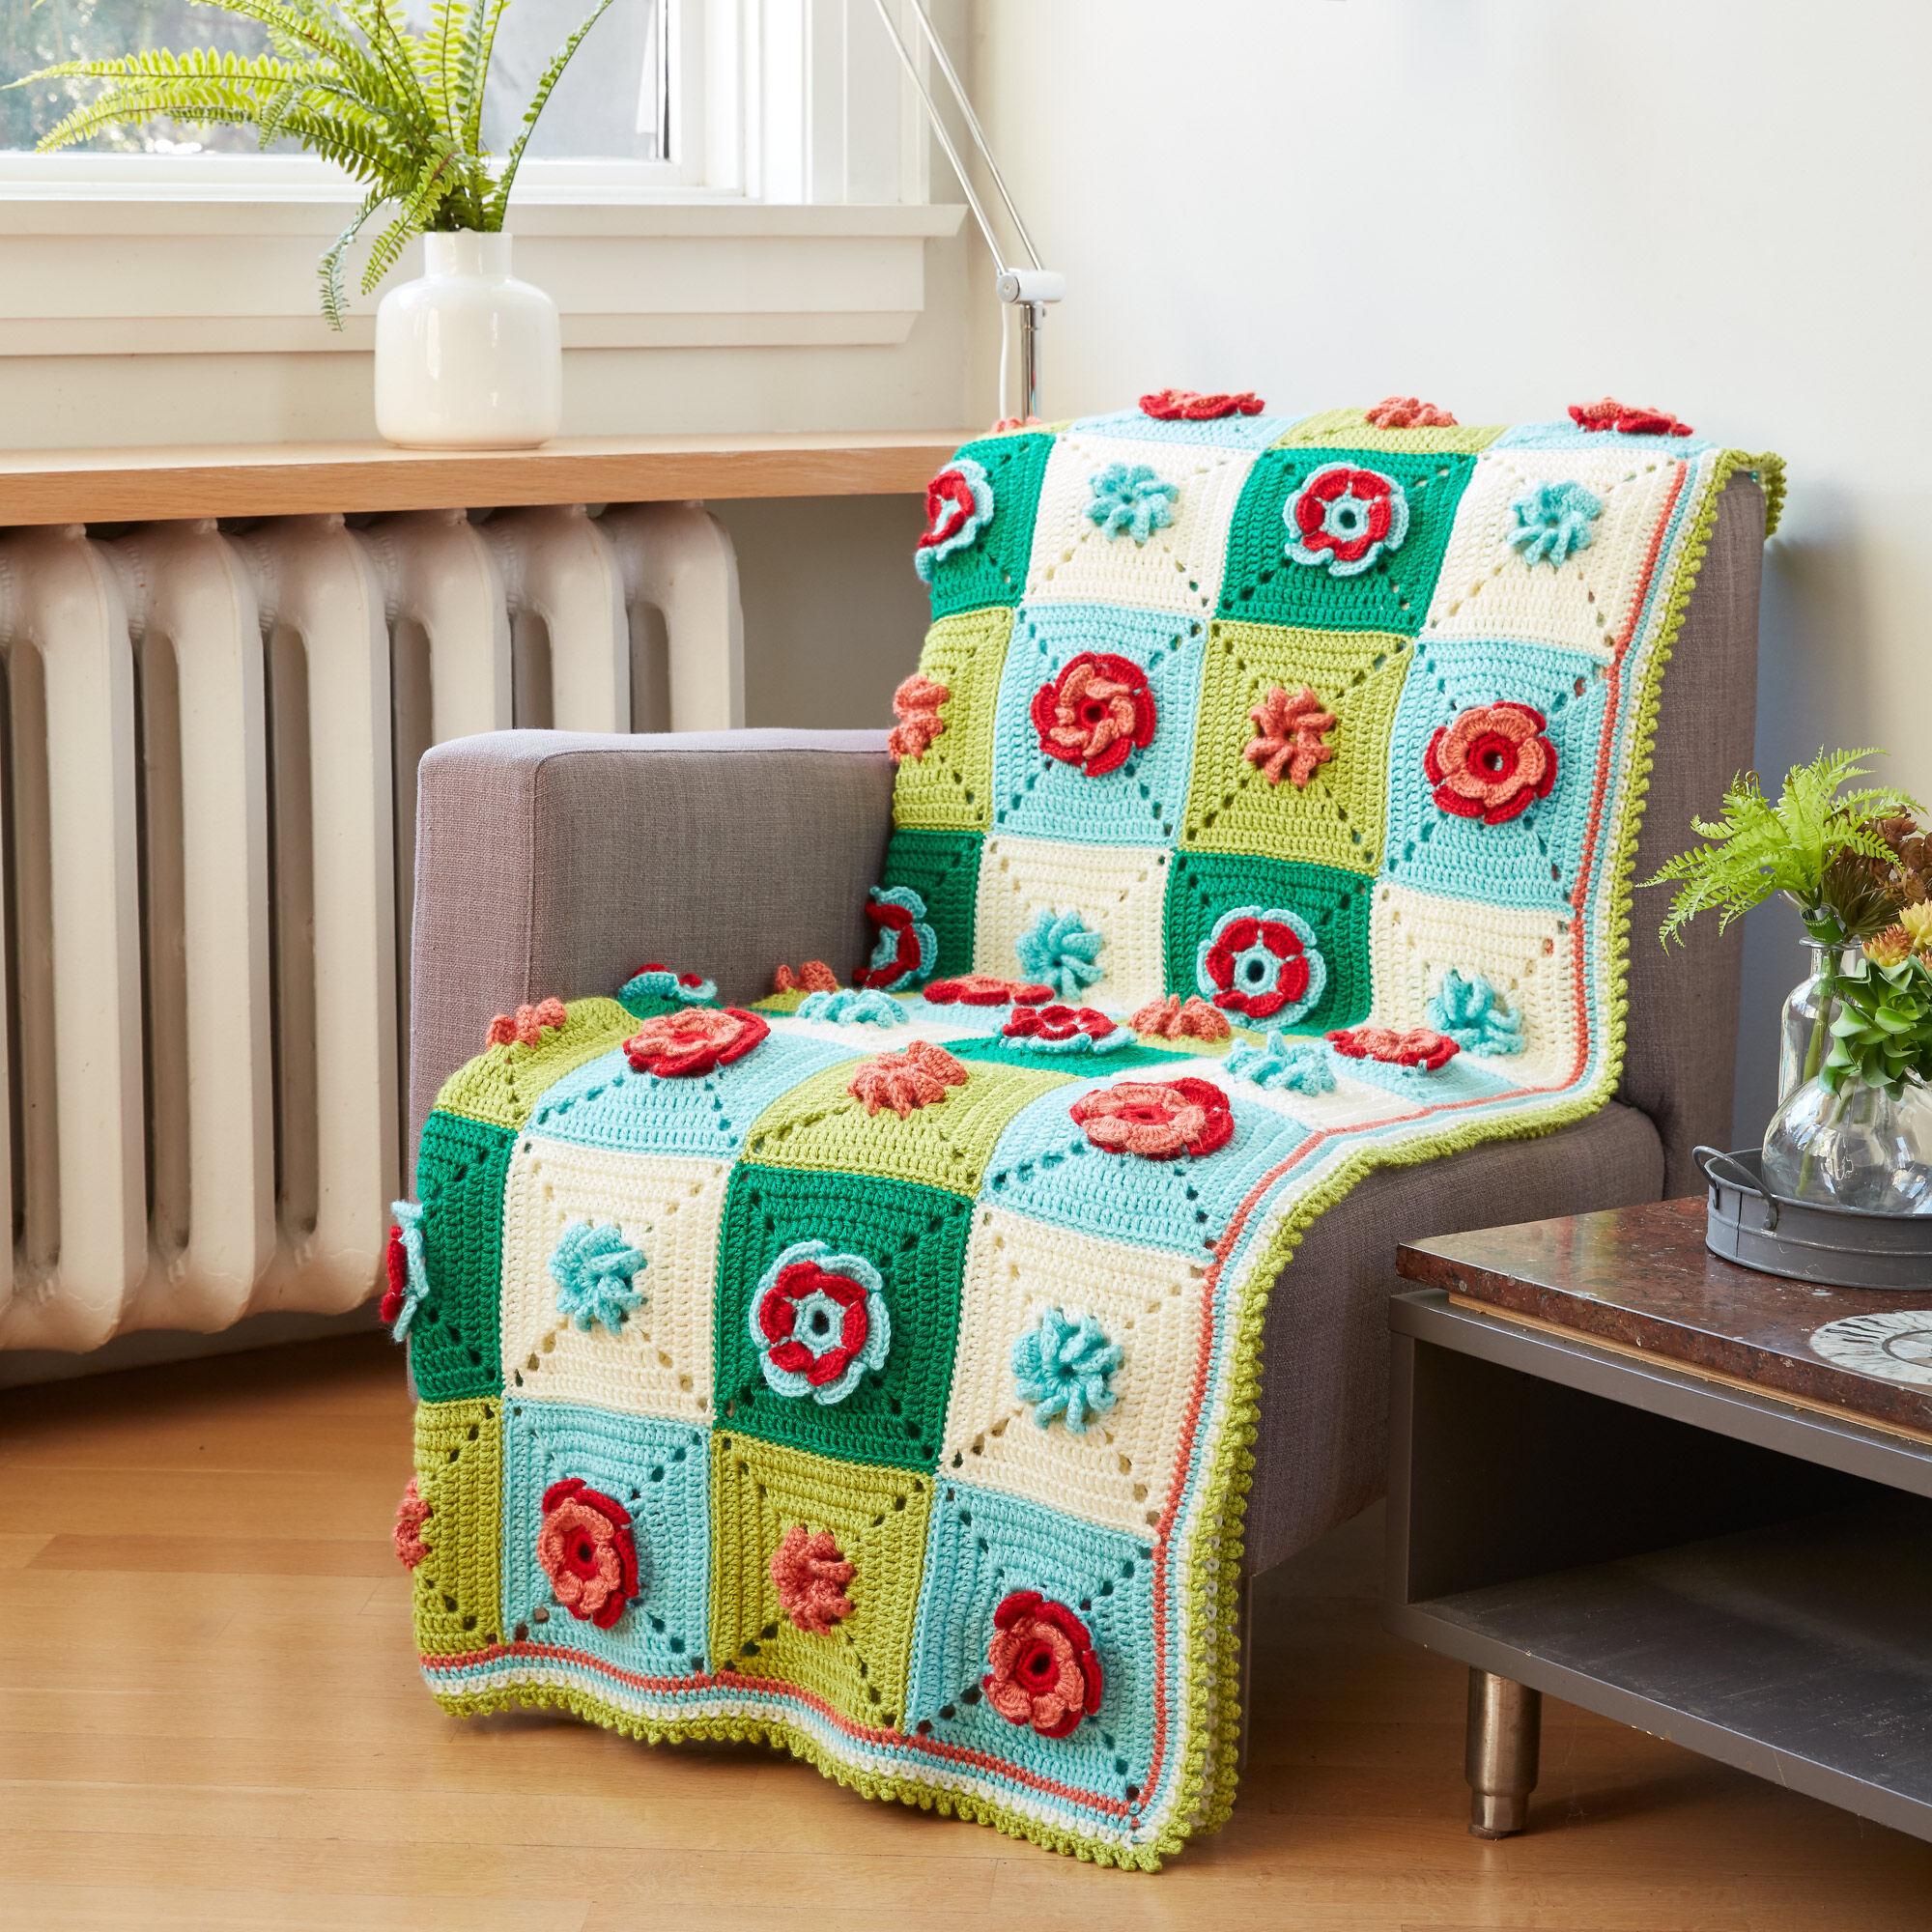 Best Easy Home Decor Crochet Free Patterns For Spring